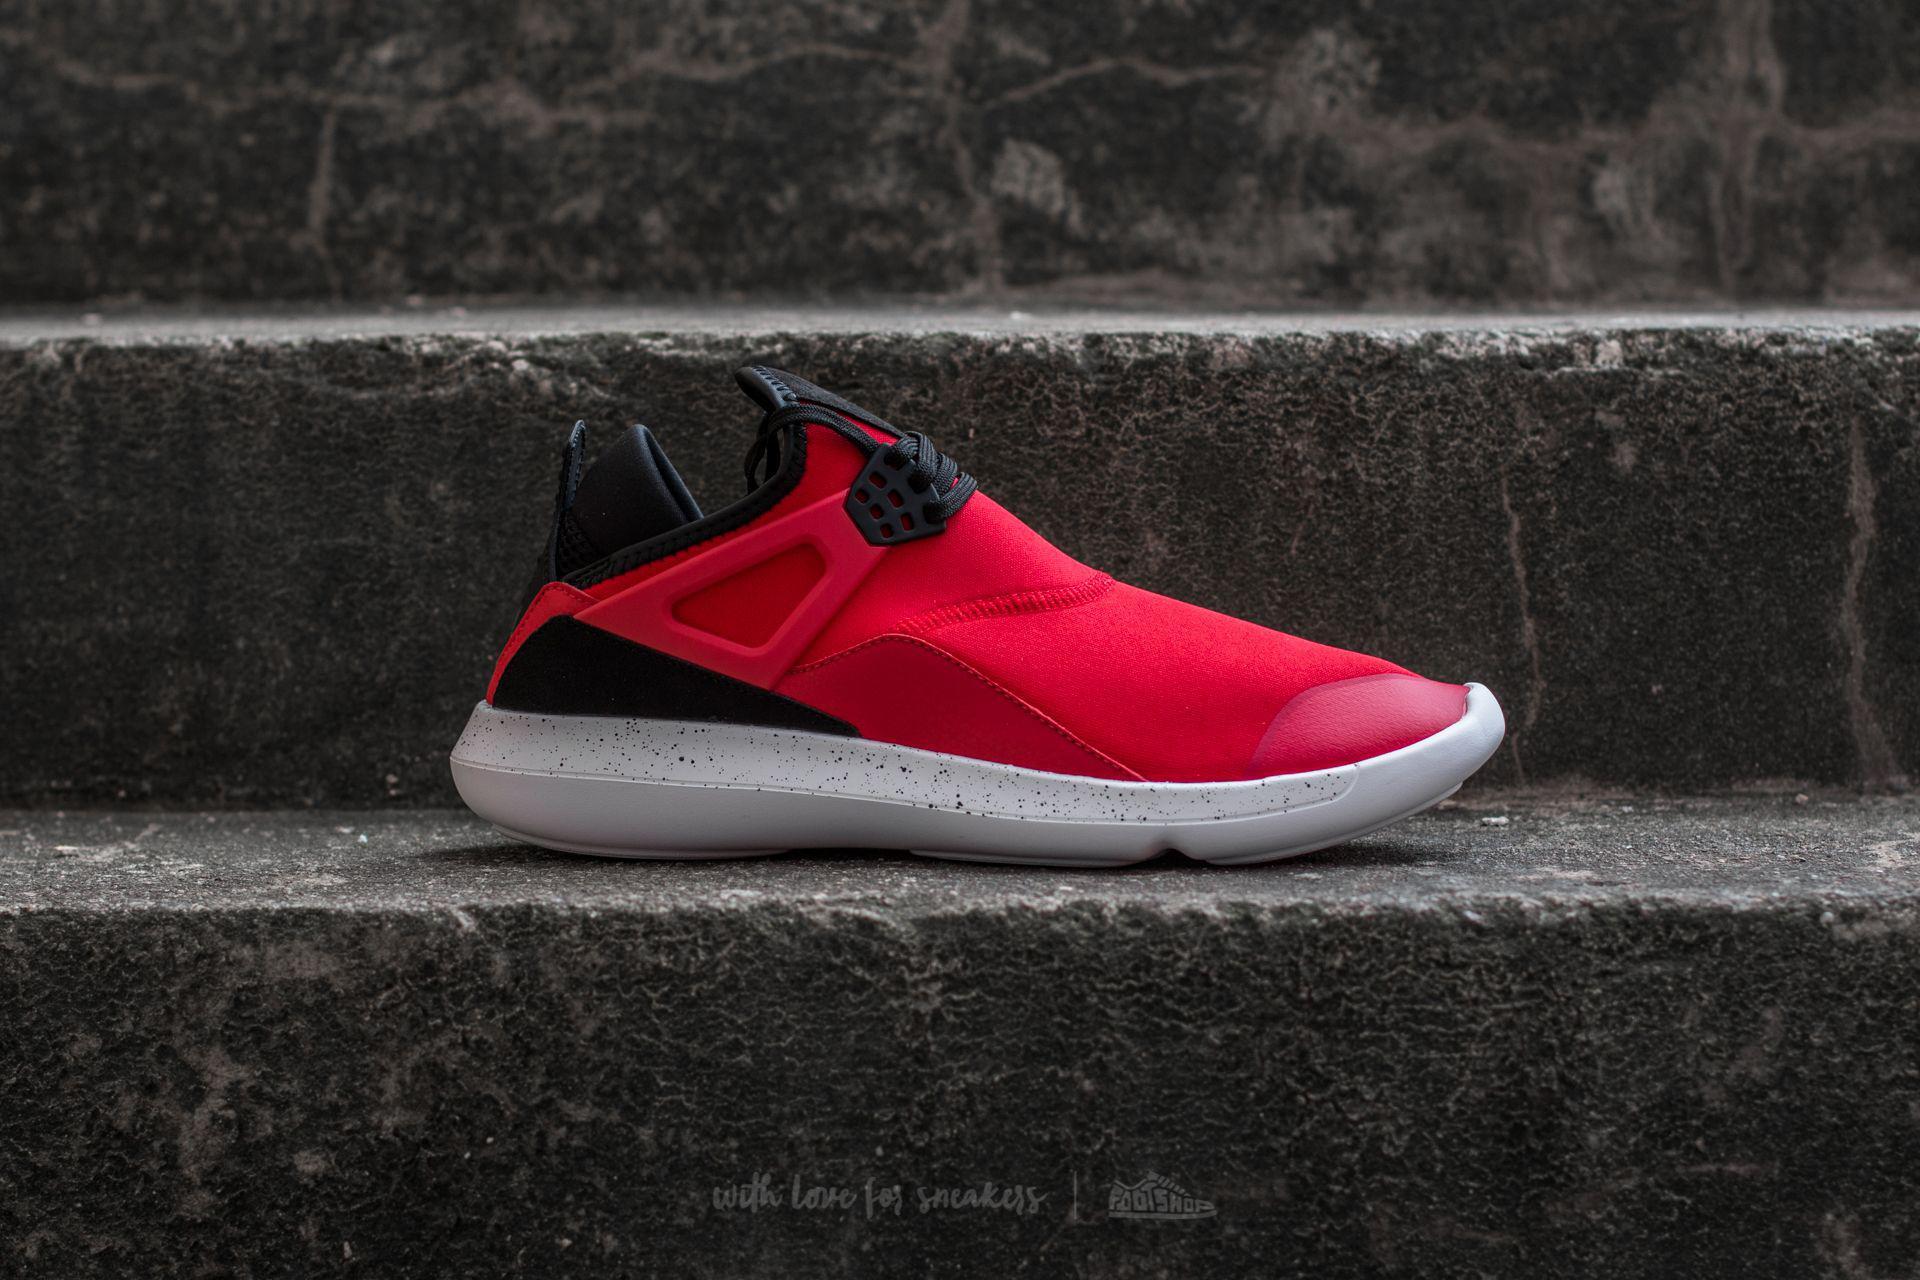 be15aeb046599 Air Jordan Fly 89  Lyst - Nike Fly ́89 University Red Black-white in Red  for Men . ...